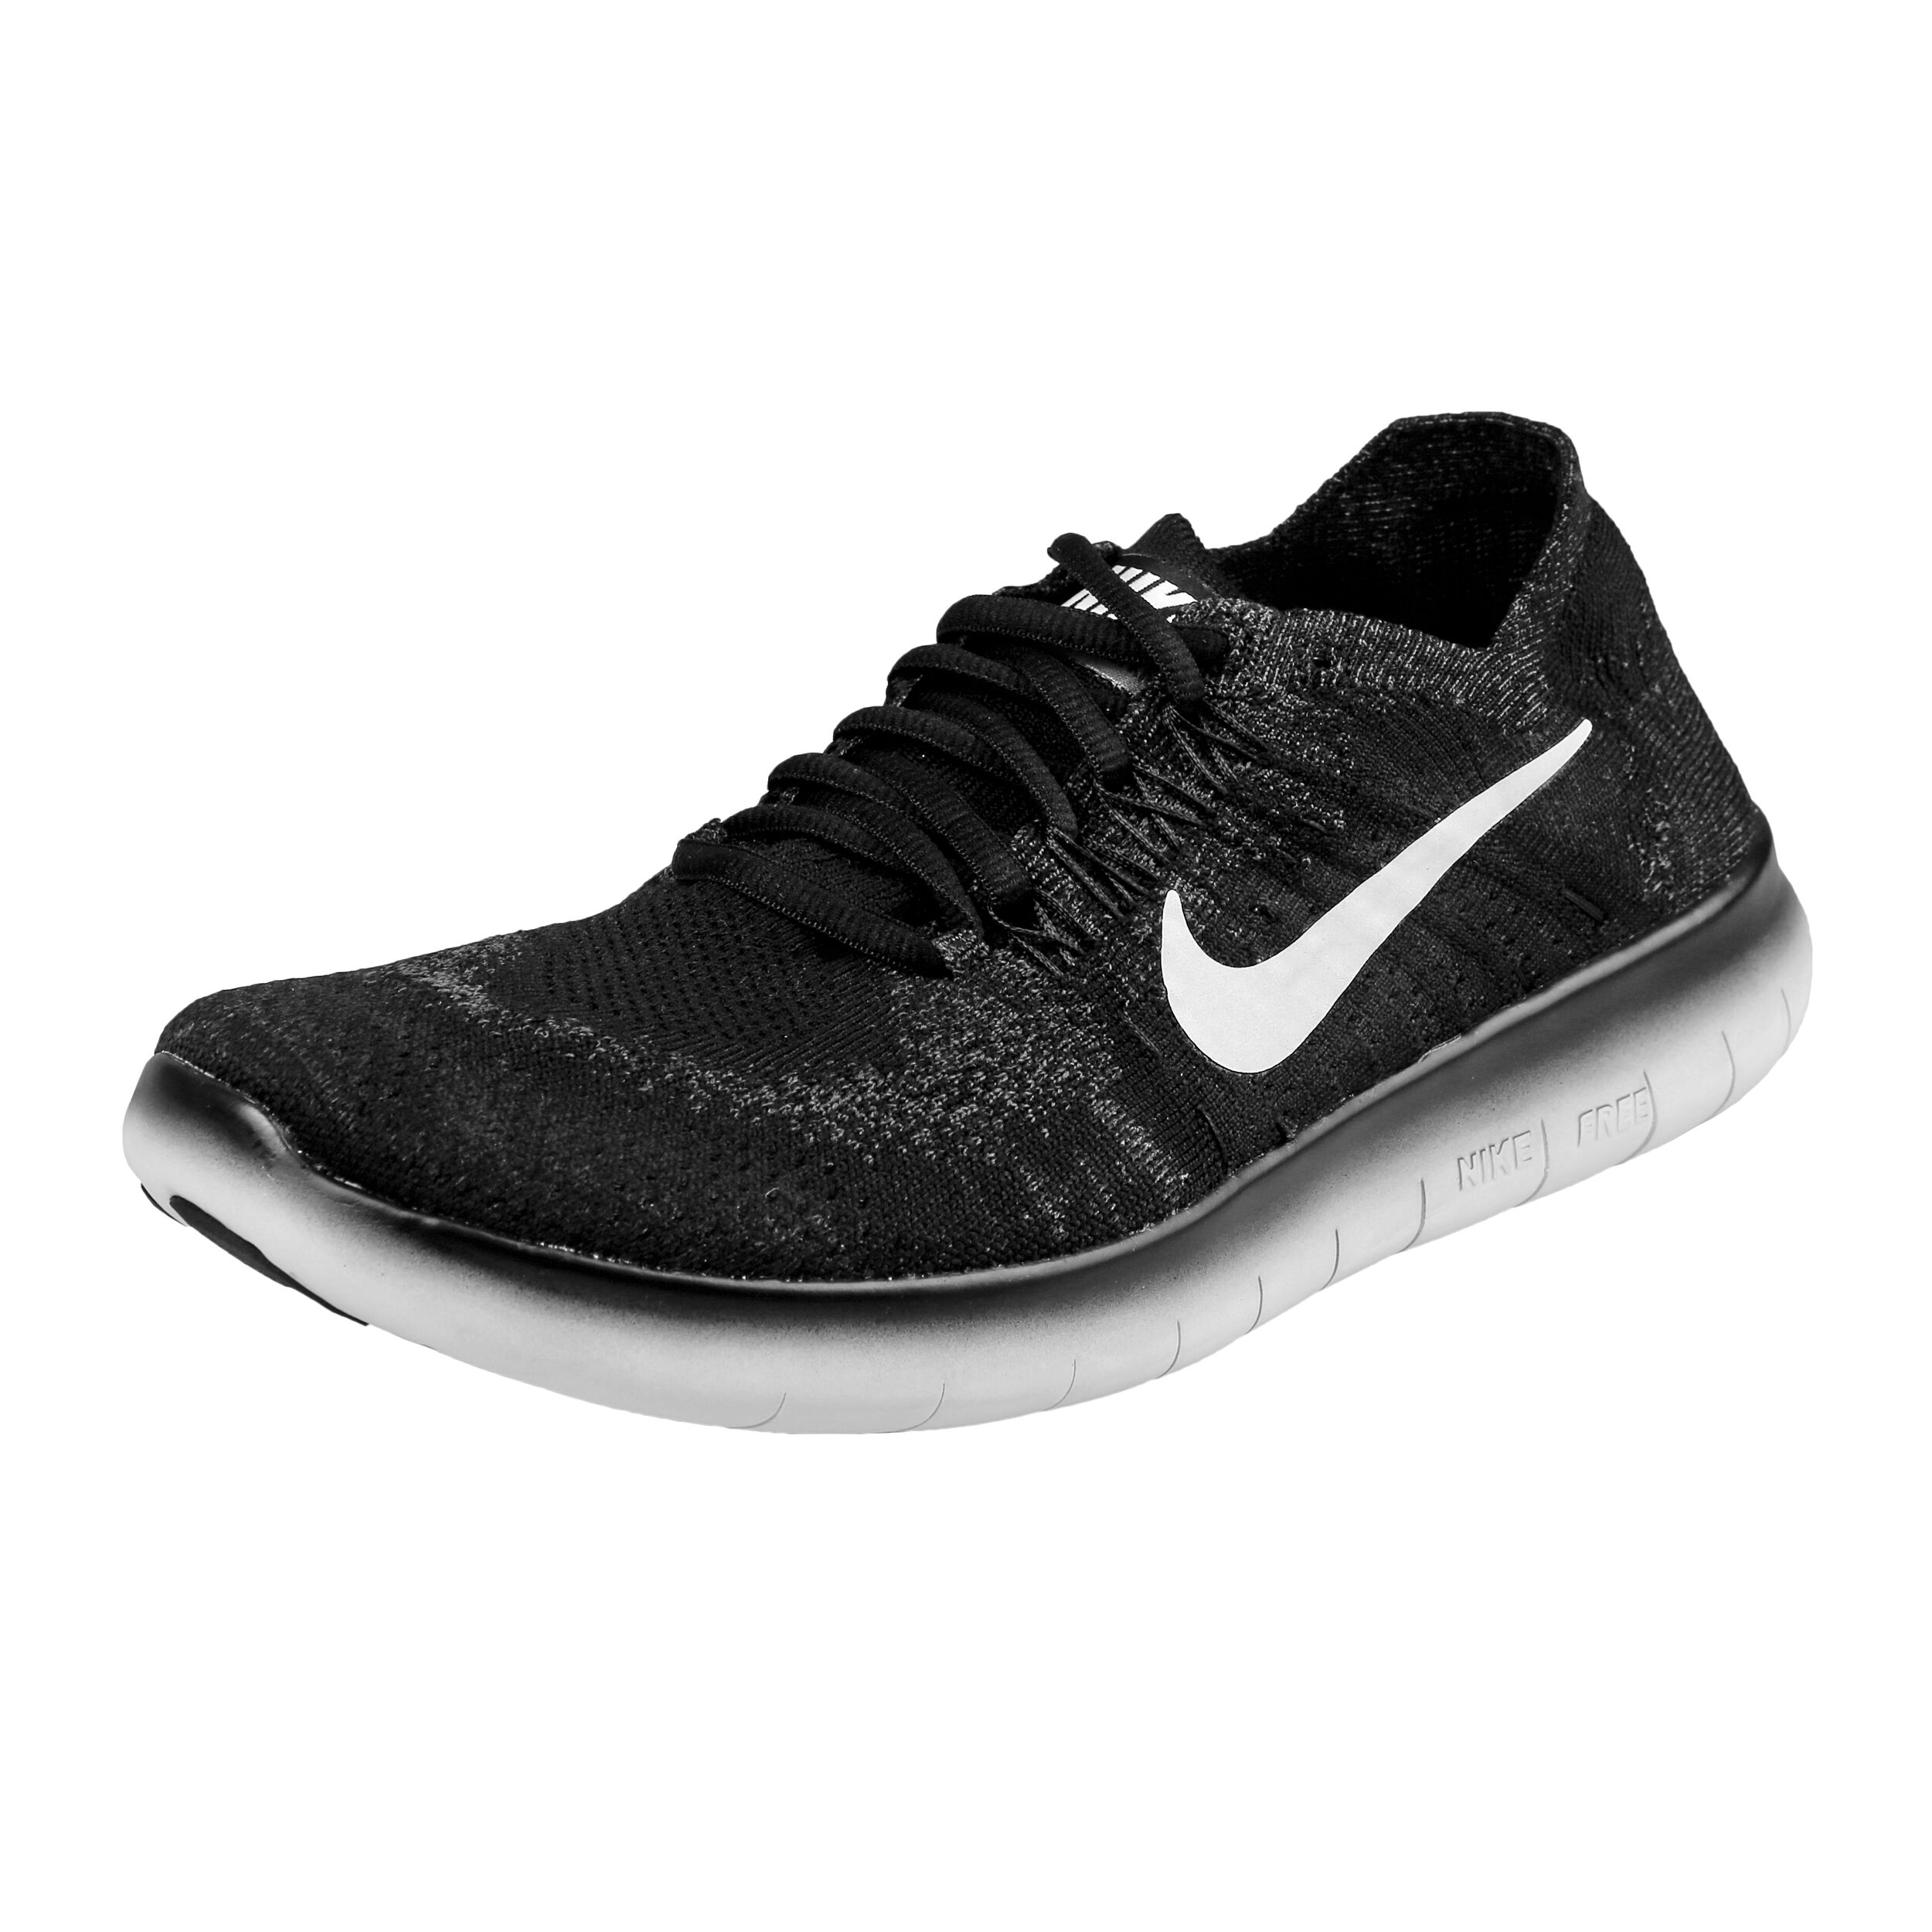 2017 Flyknit Run Femmes C3f1utljk Noirblanc Chaussure Nike Free Fitness N0wv8nmO